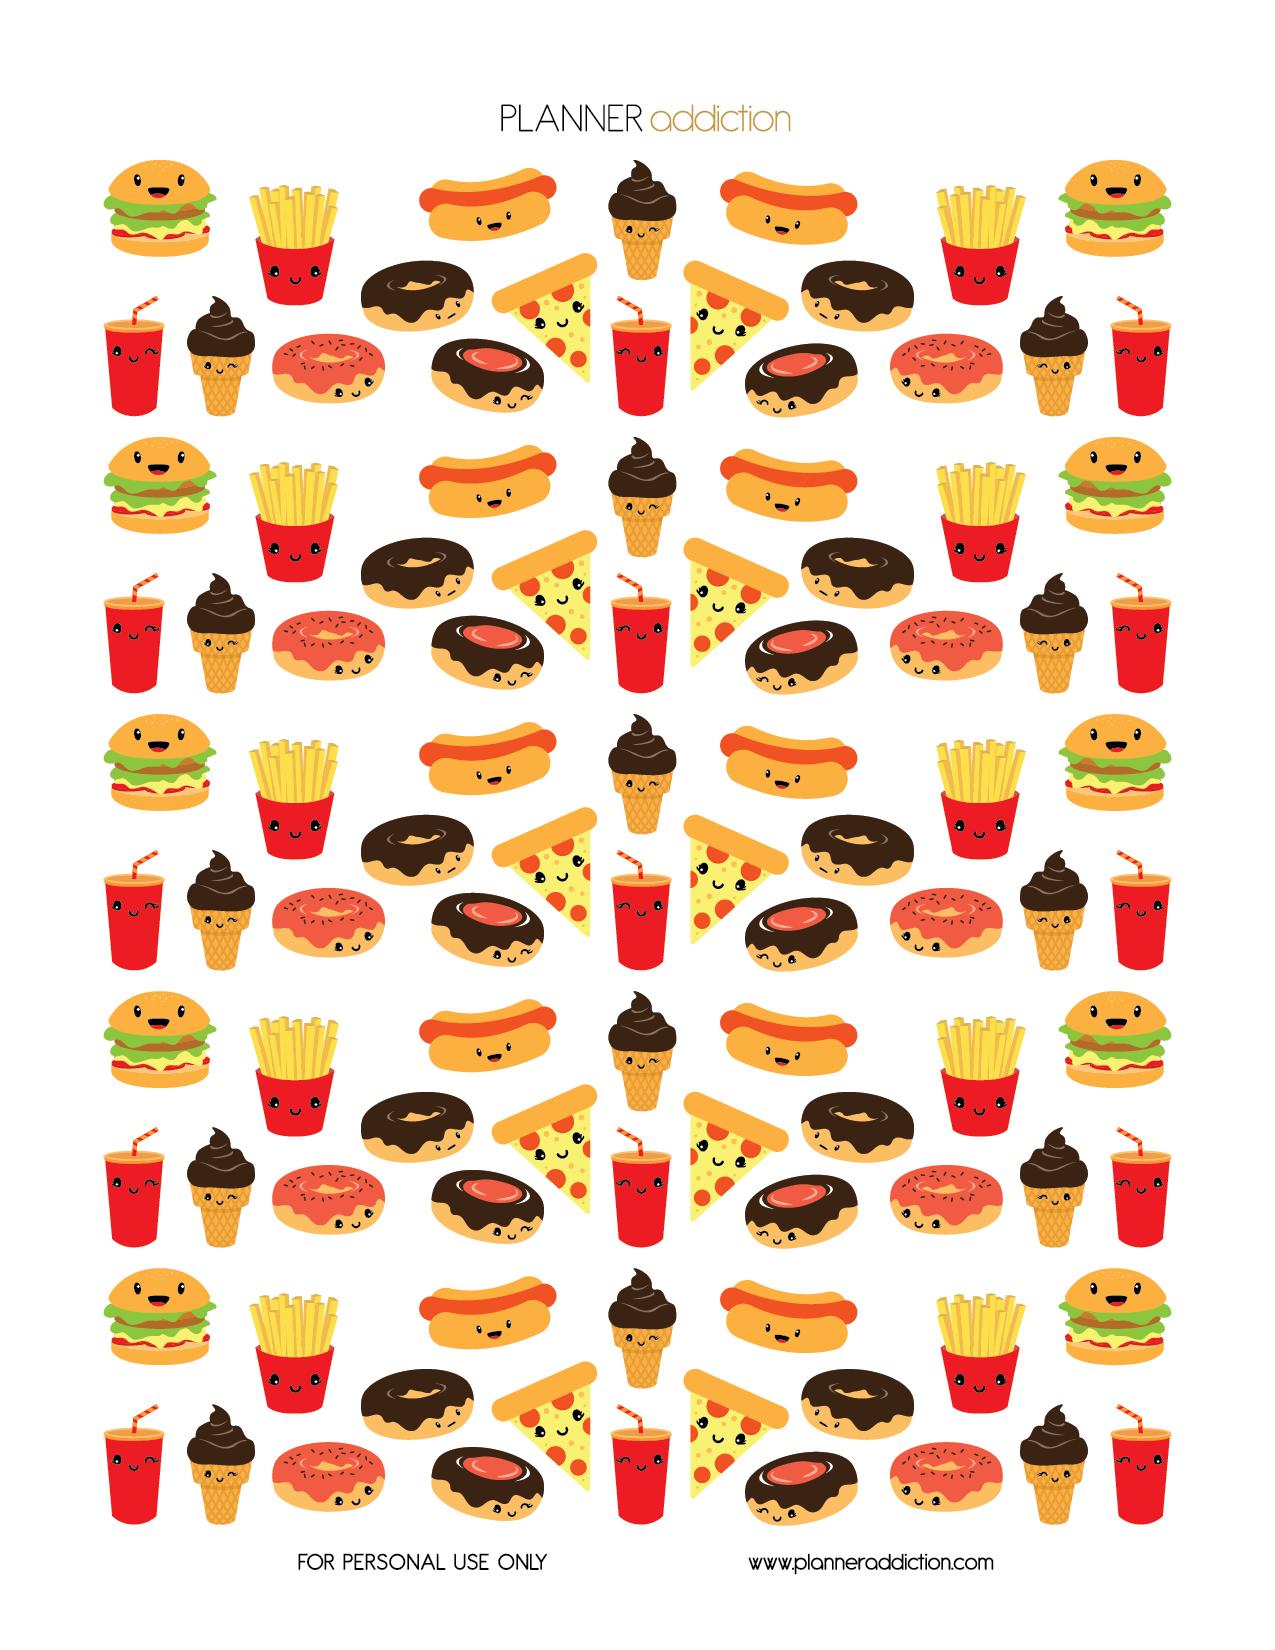 Fast Food Kawaii Planner Addiction